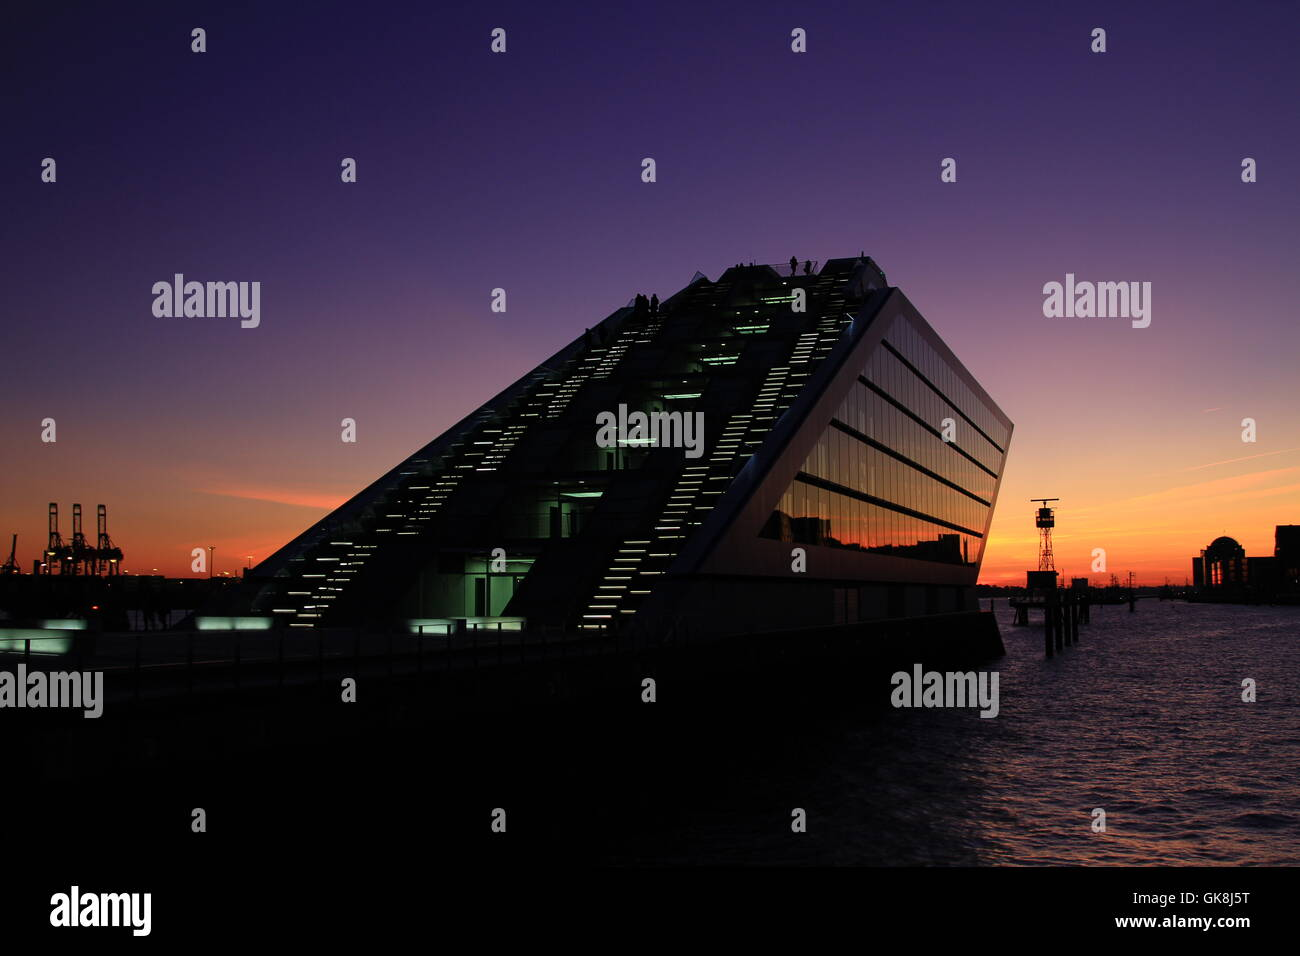 harbor hamburg gangplanks - Stock Image